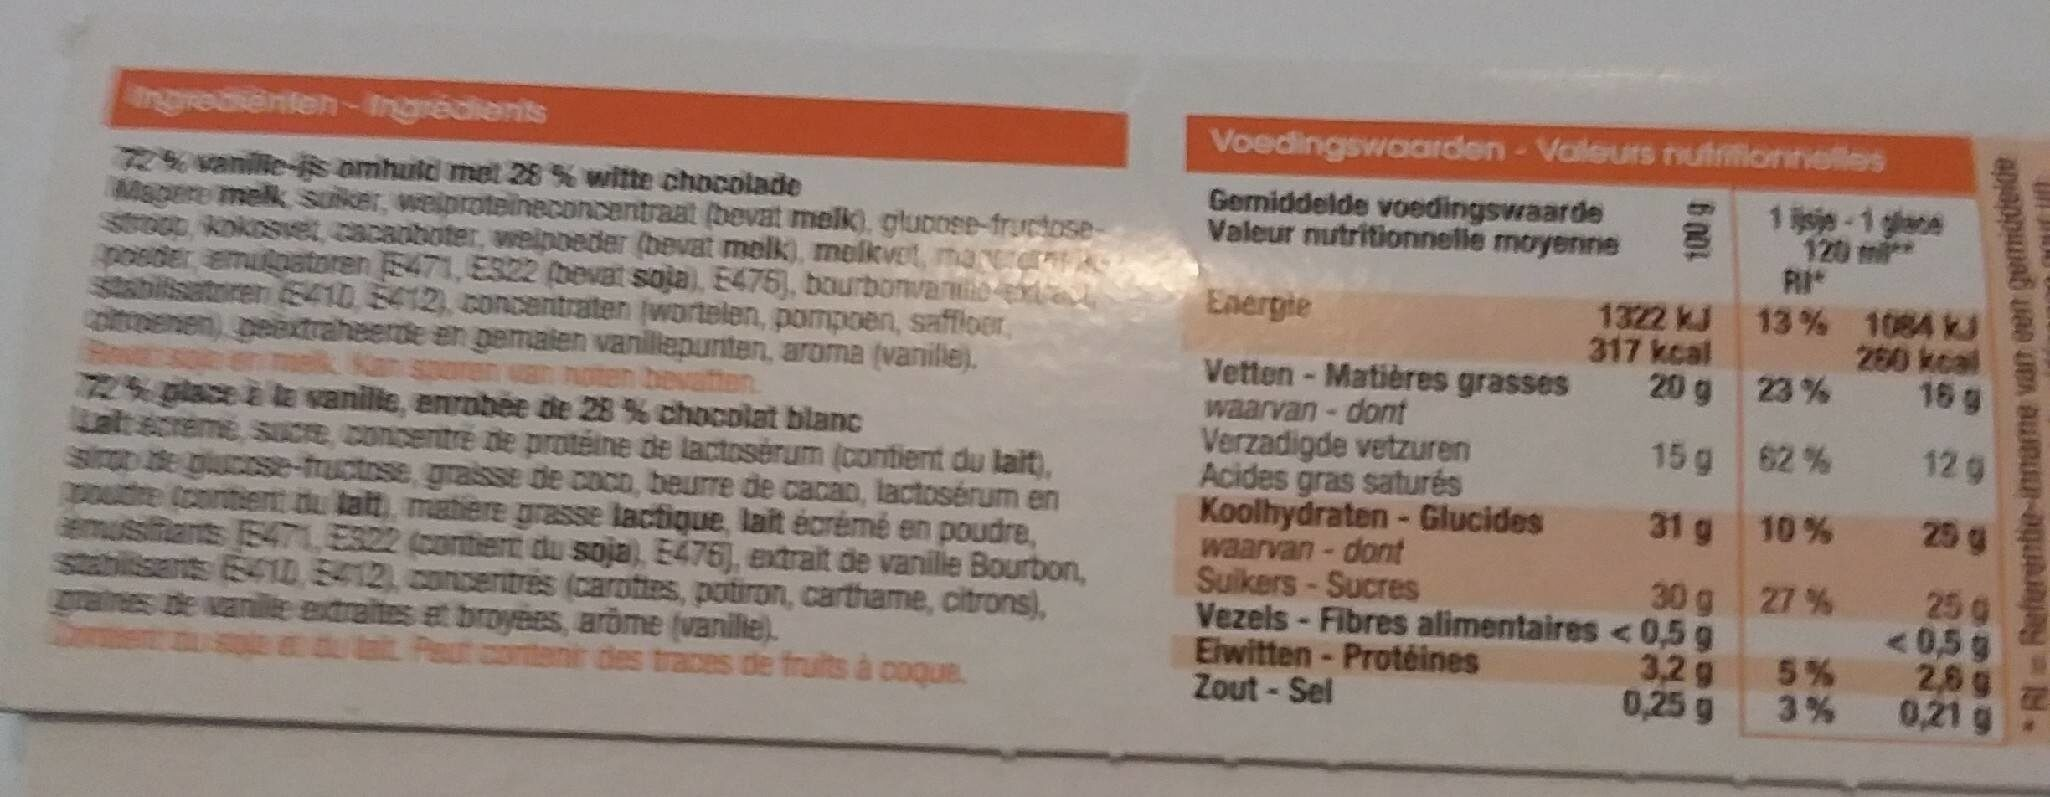 Glaces à la vanille - Voedingswaarden - fr